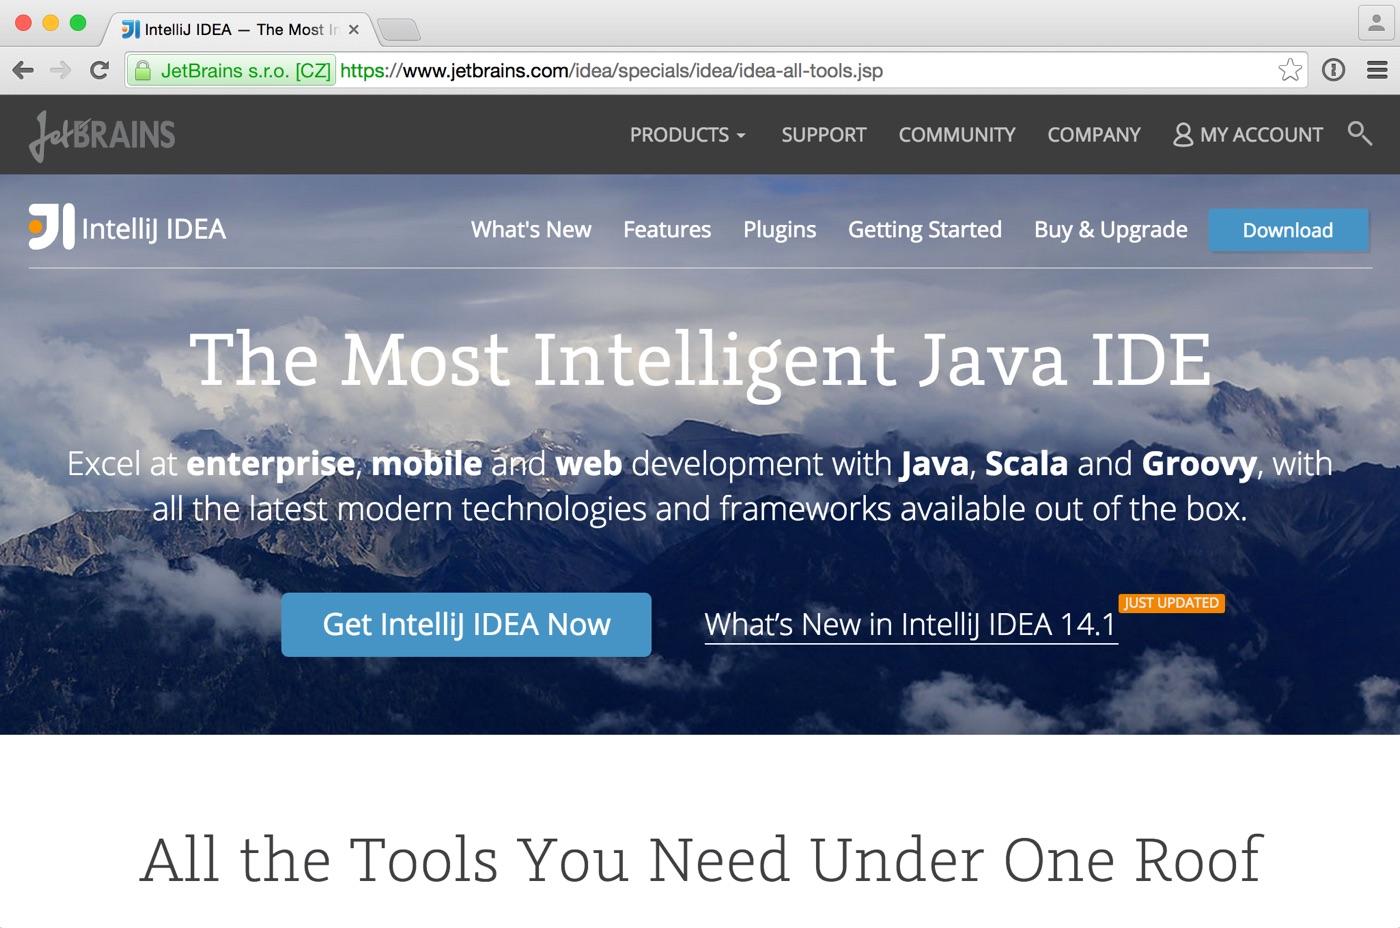 intellij-idea-database-tools